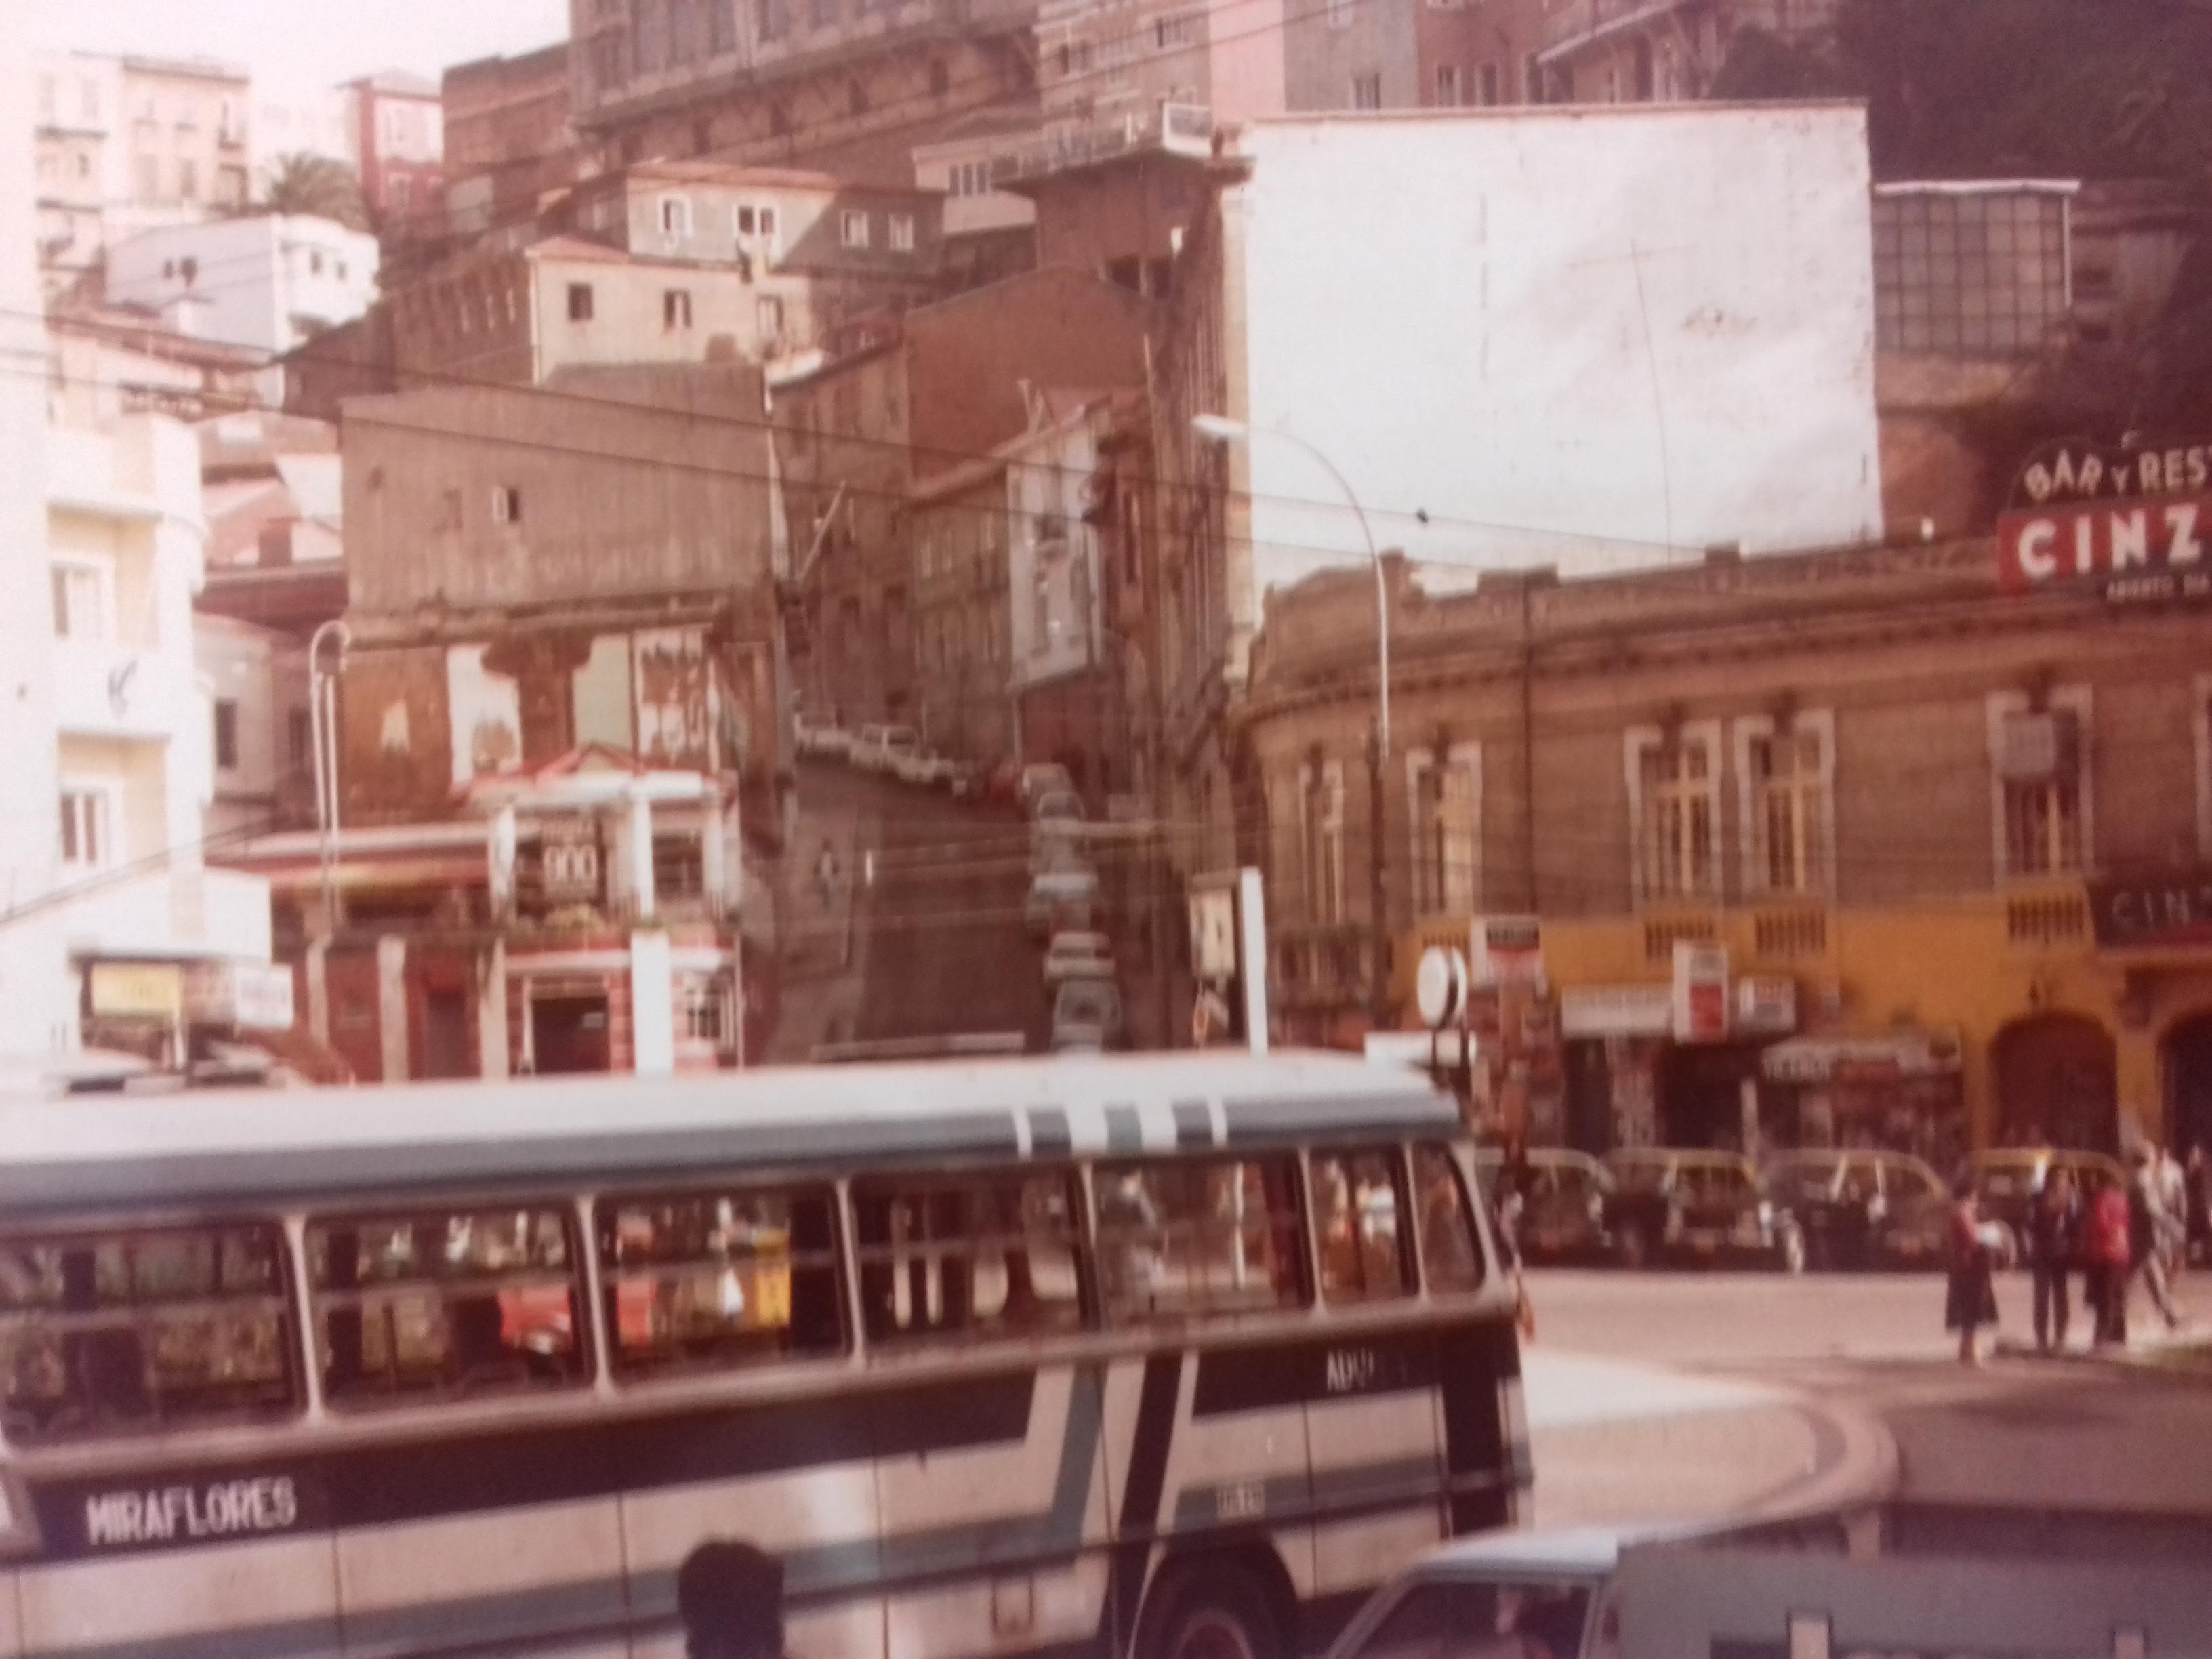 Enterreno - Fotos históricas de chile - fotos antiguas de Chile - Valparaíso, 1982